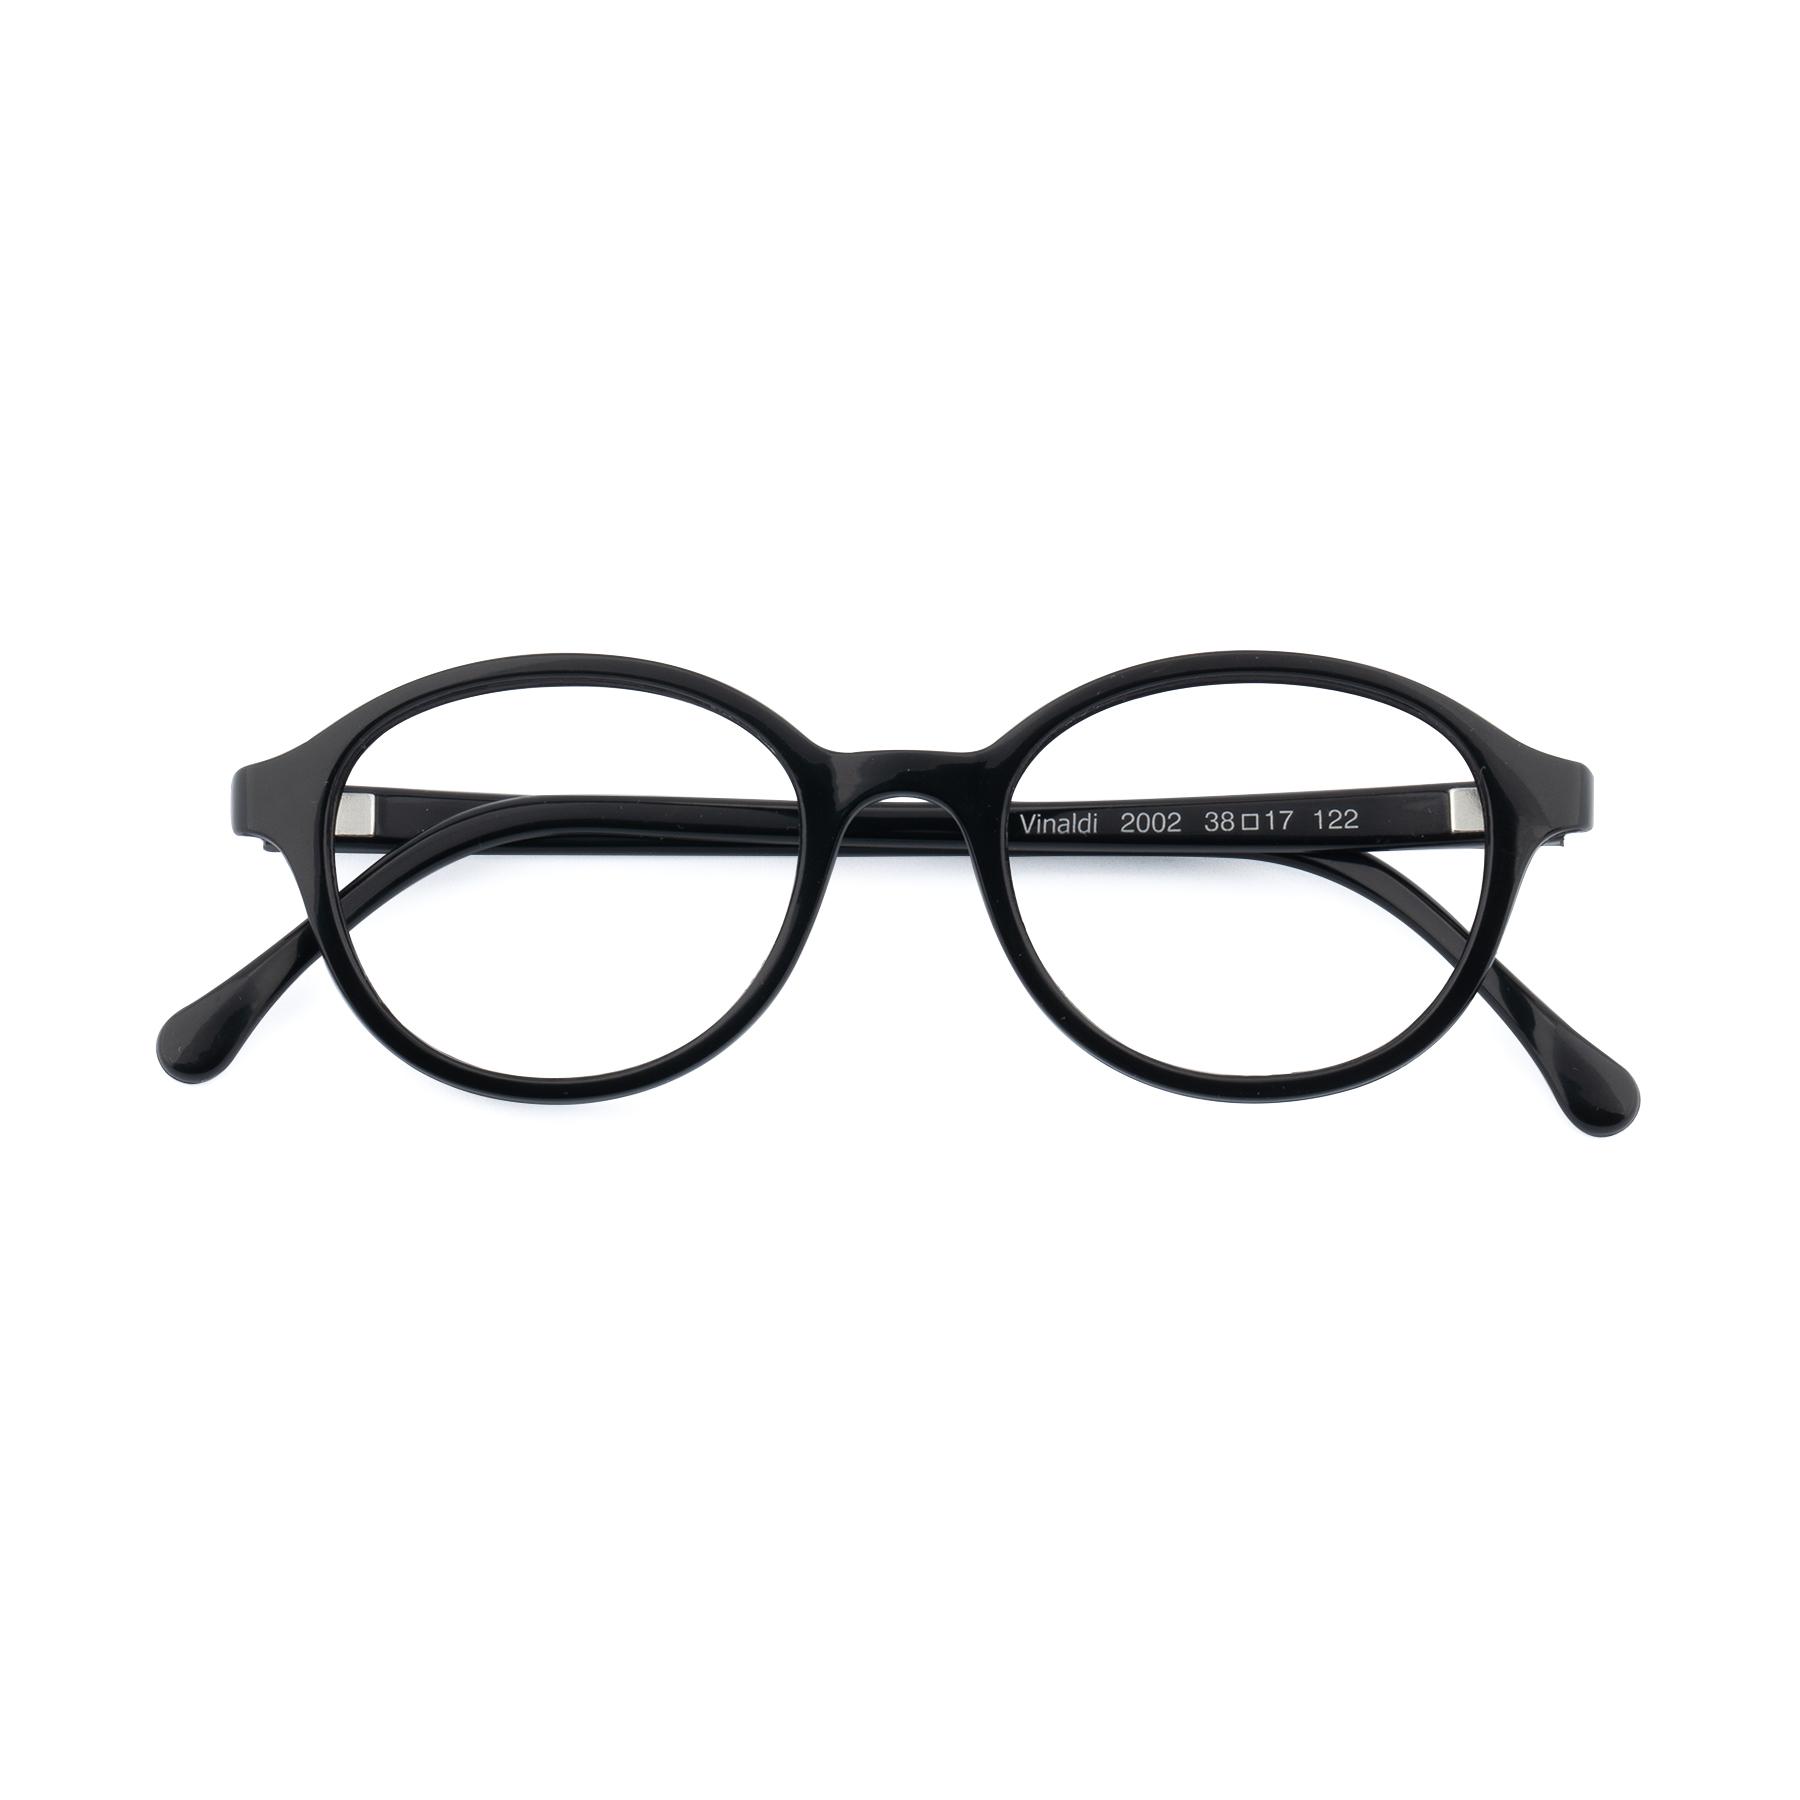 Vinaldi 2002 Eyeglass Frame